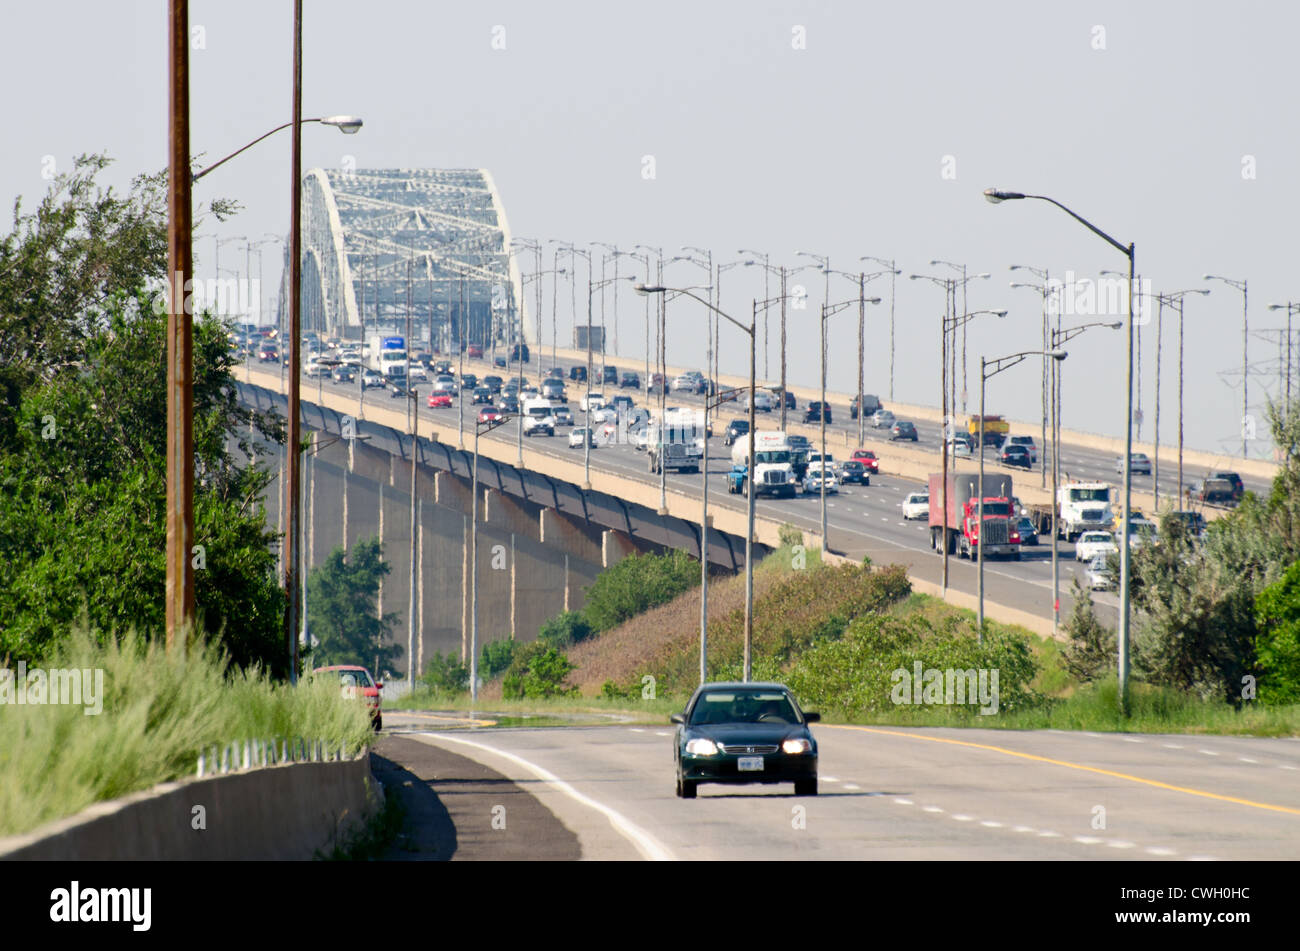 Hot day on Skyway bridge - Stock Image